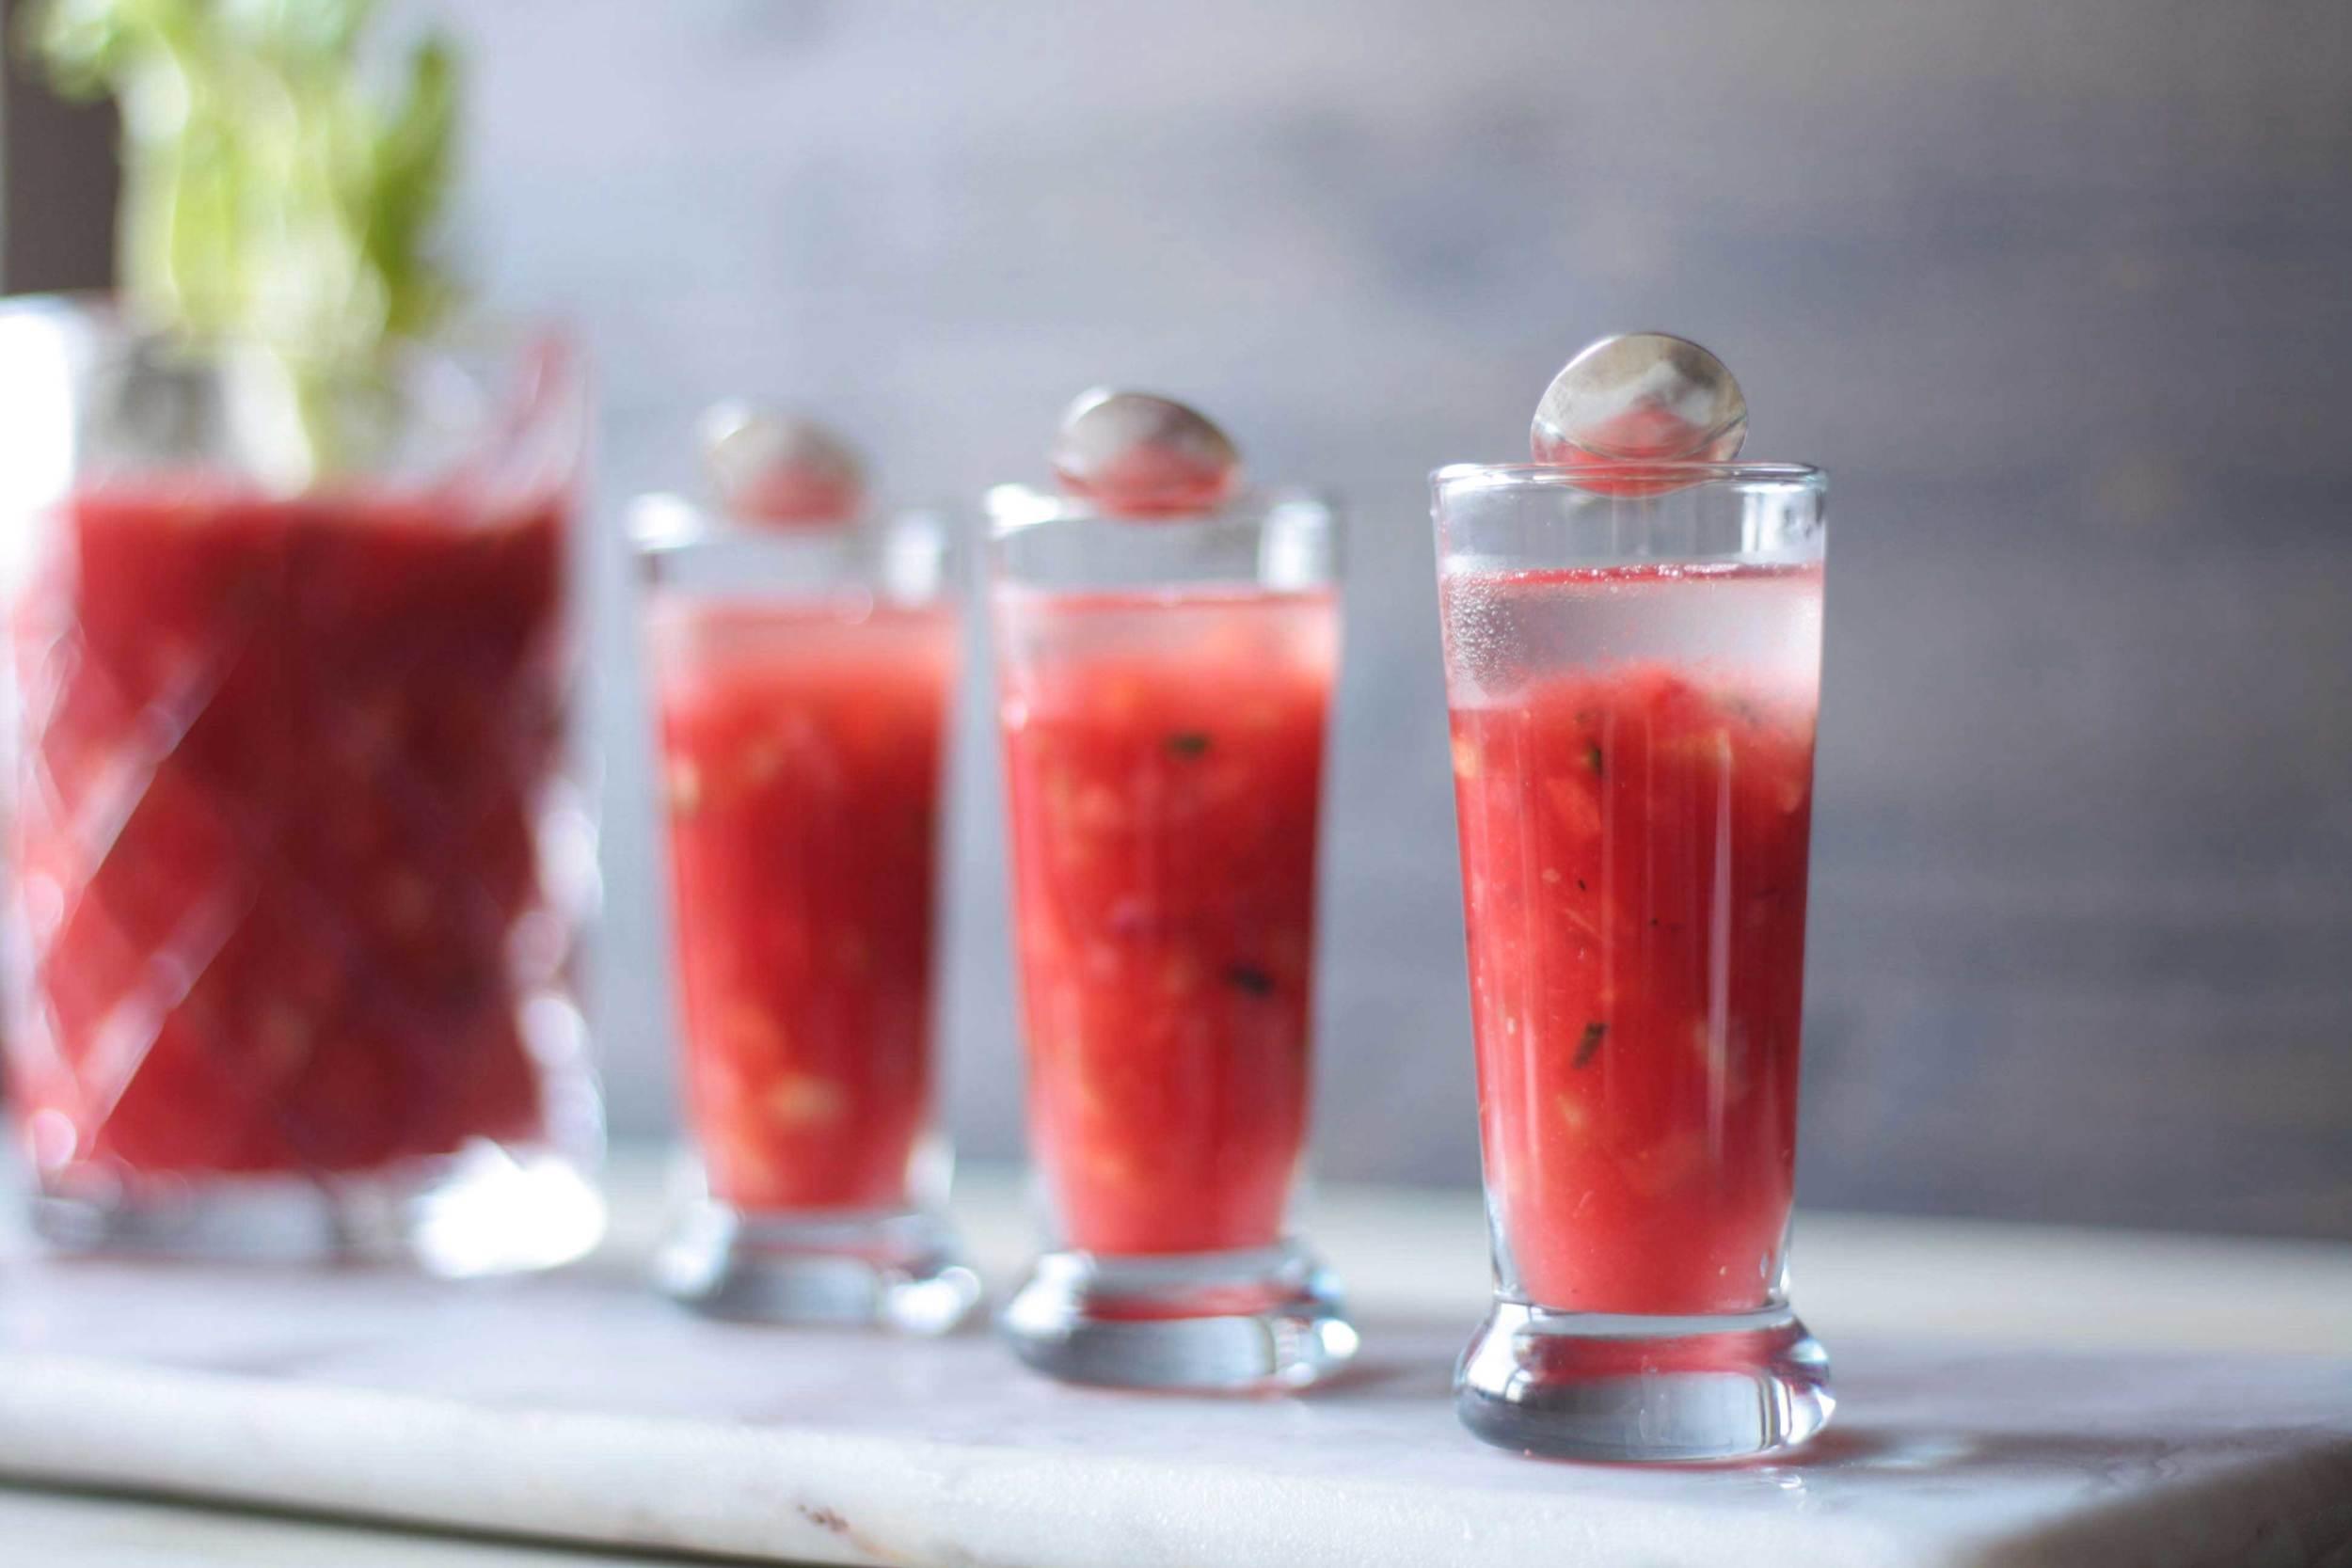 Watermelon Gazpacho Shots